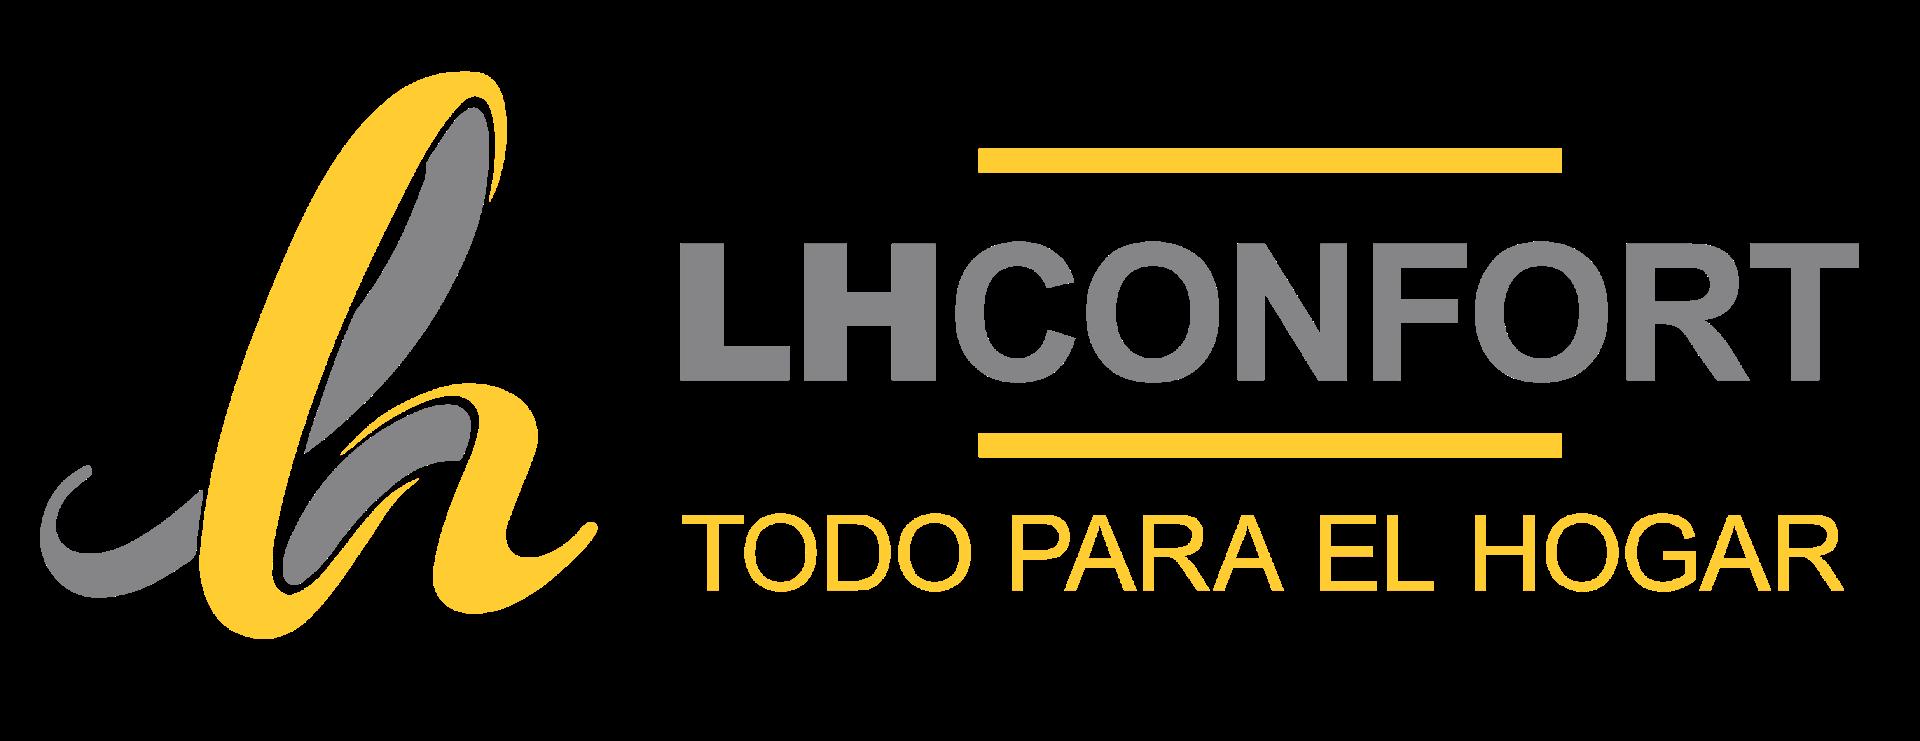 LHCONFORT